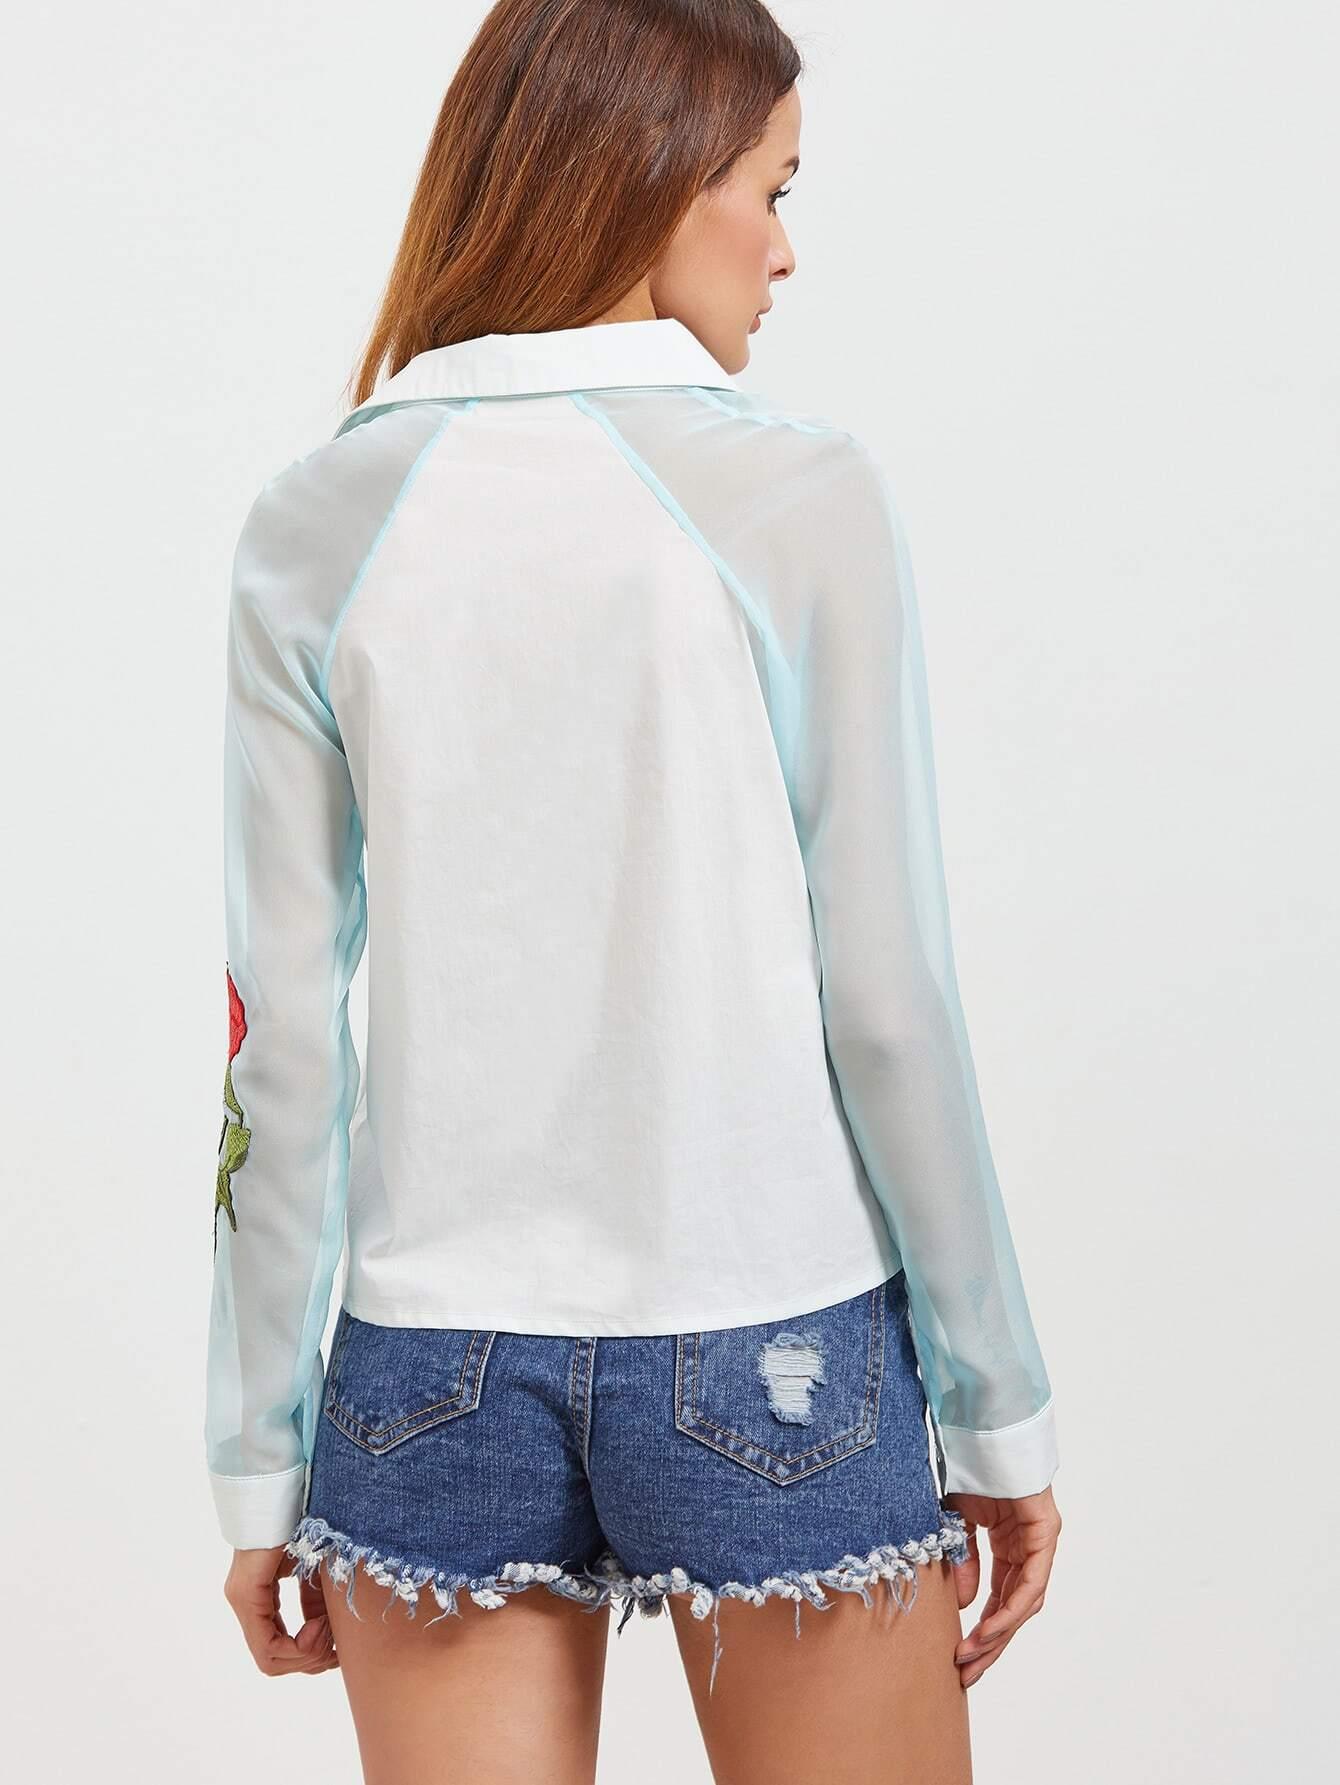 blouse161228702_2